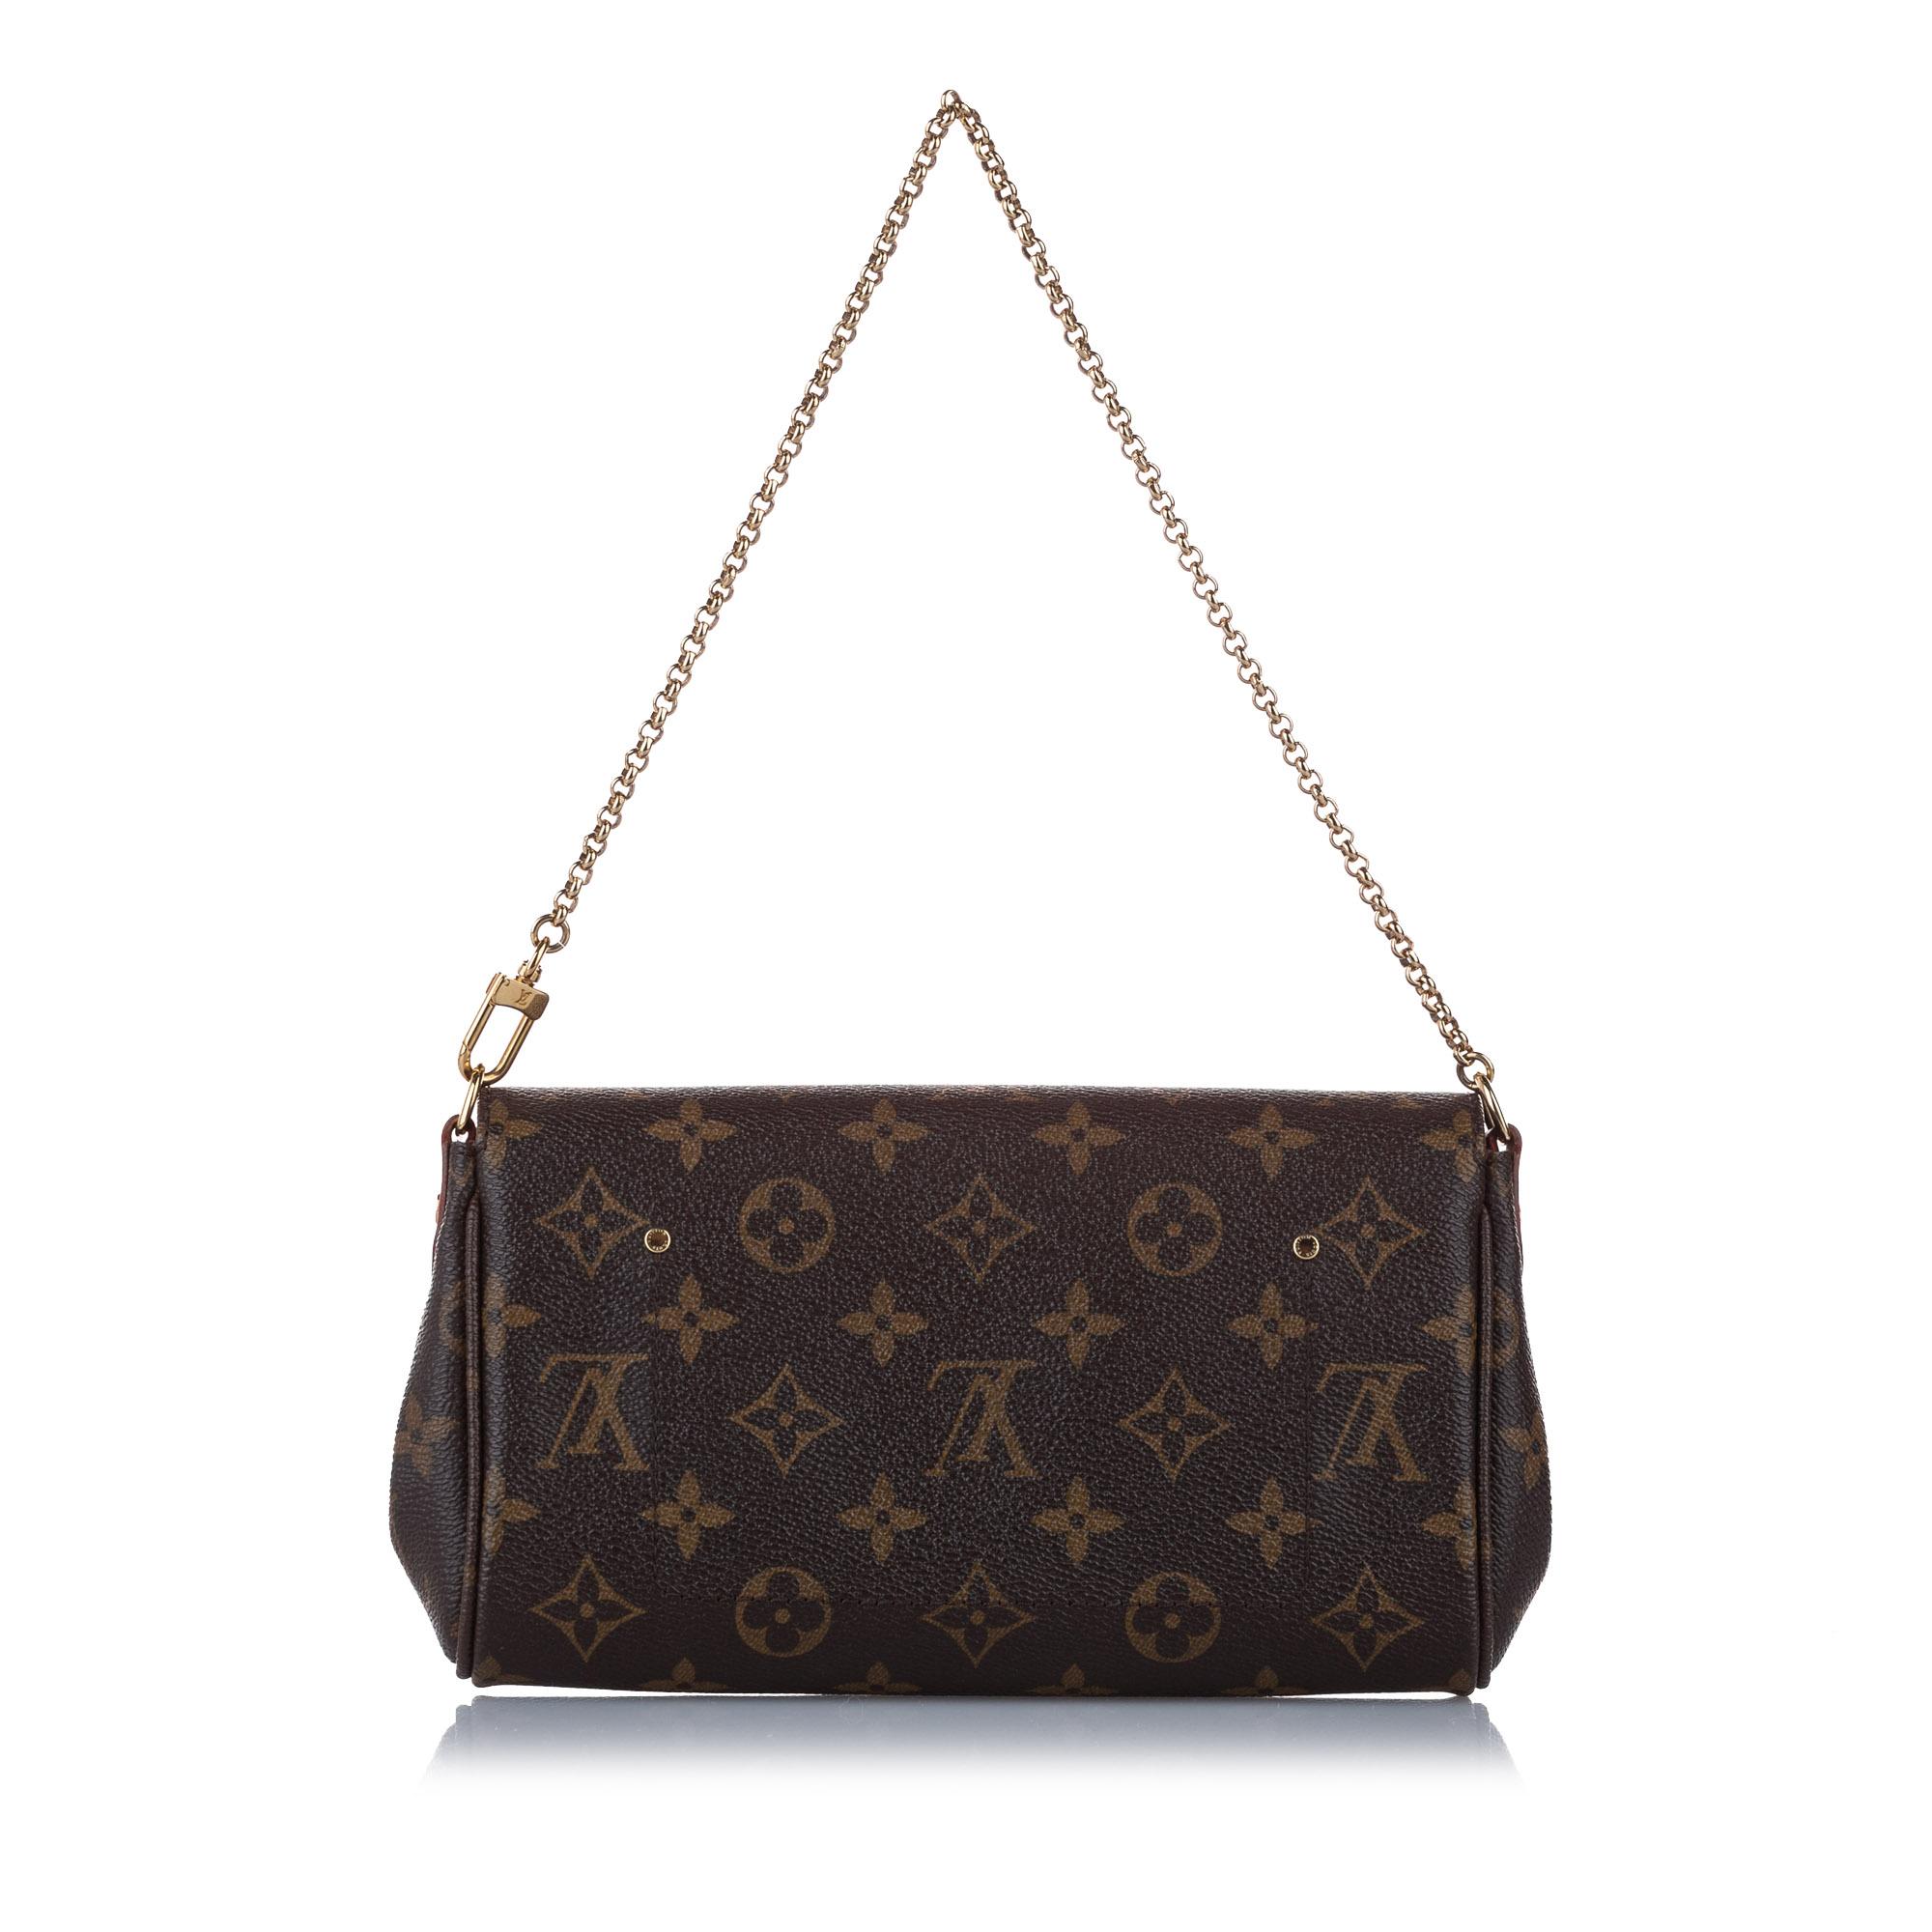 Louis Vuitton Monogram Favorite PM